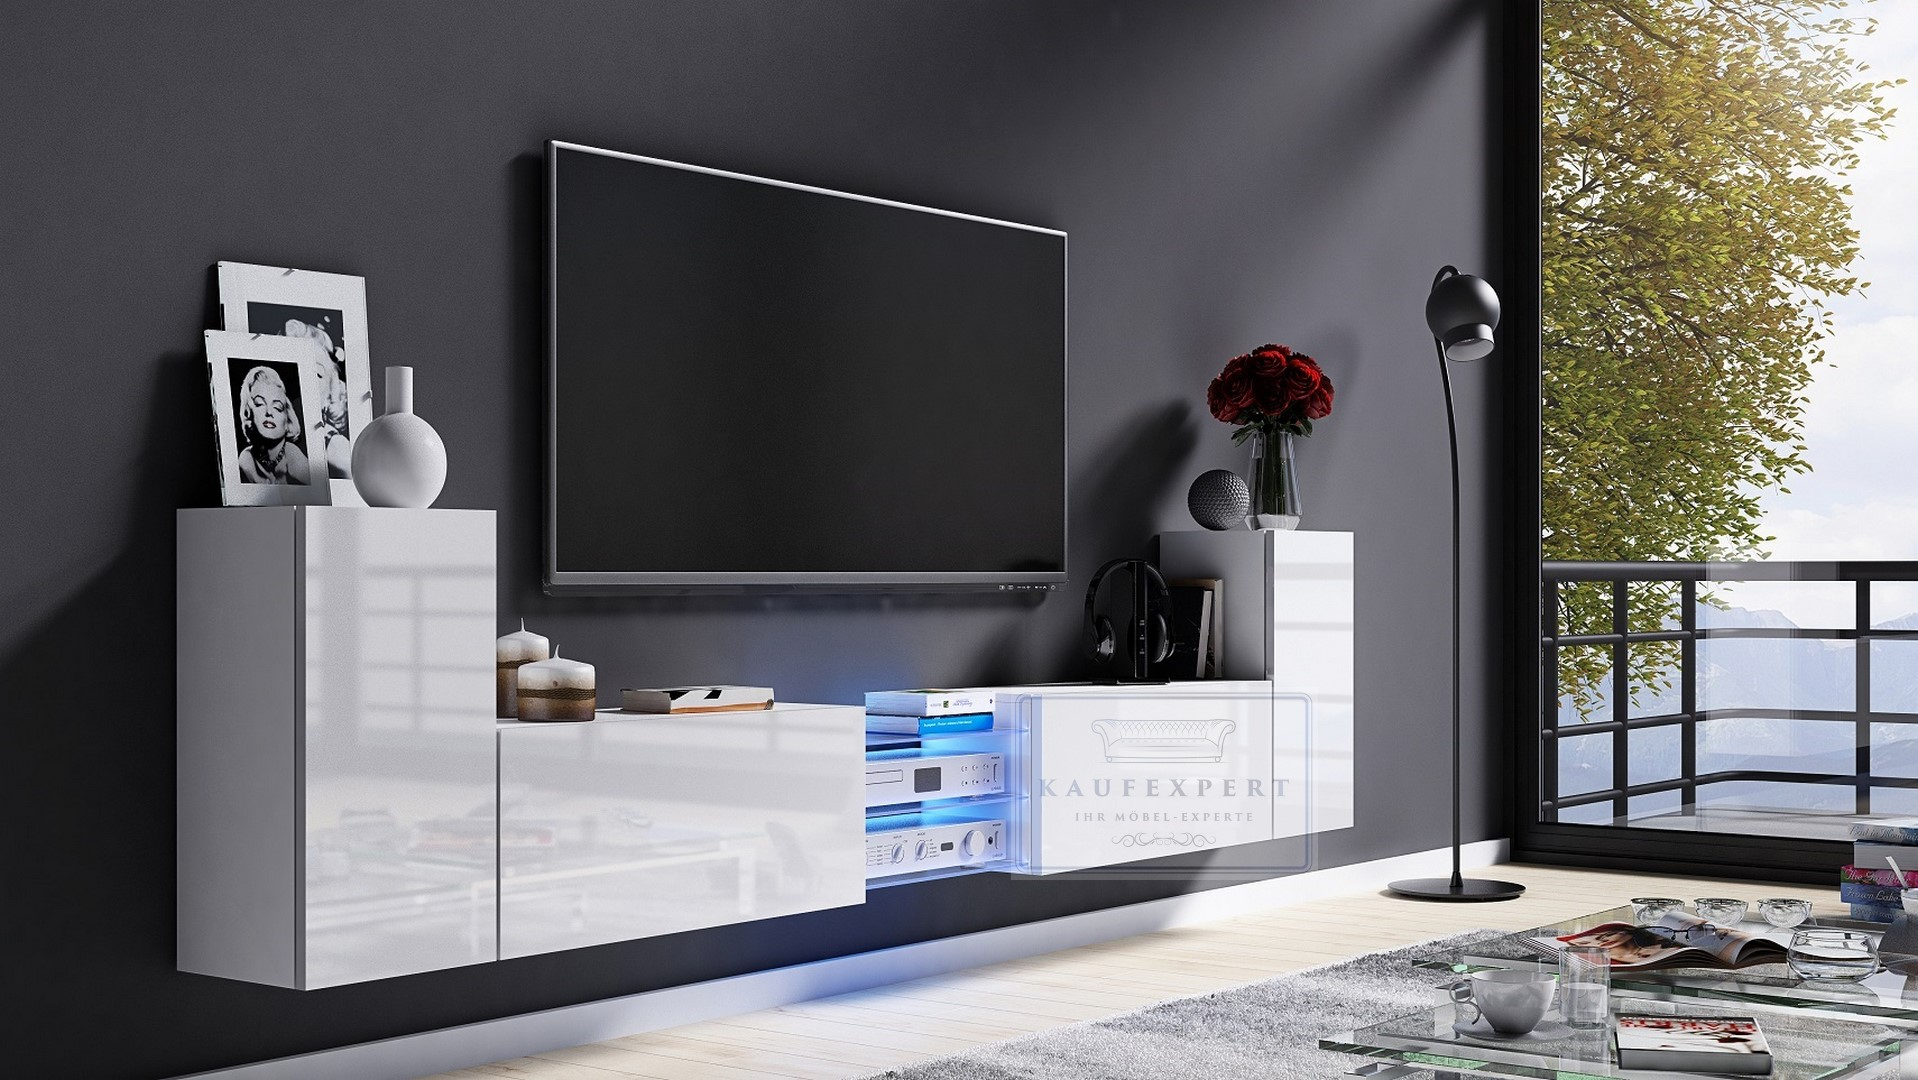 Design lowboard weiß hochglanz  KAUFEXPERT - Tv Lowboard Galaxy Weiß Hochglanz/Weiß MDF Design Board ...